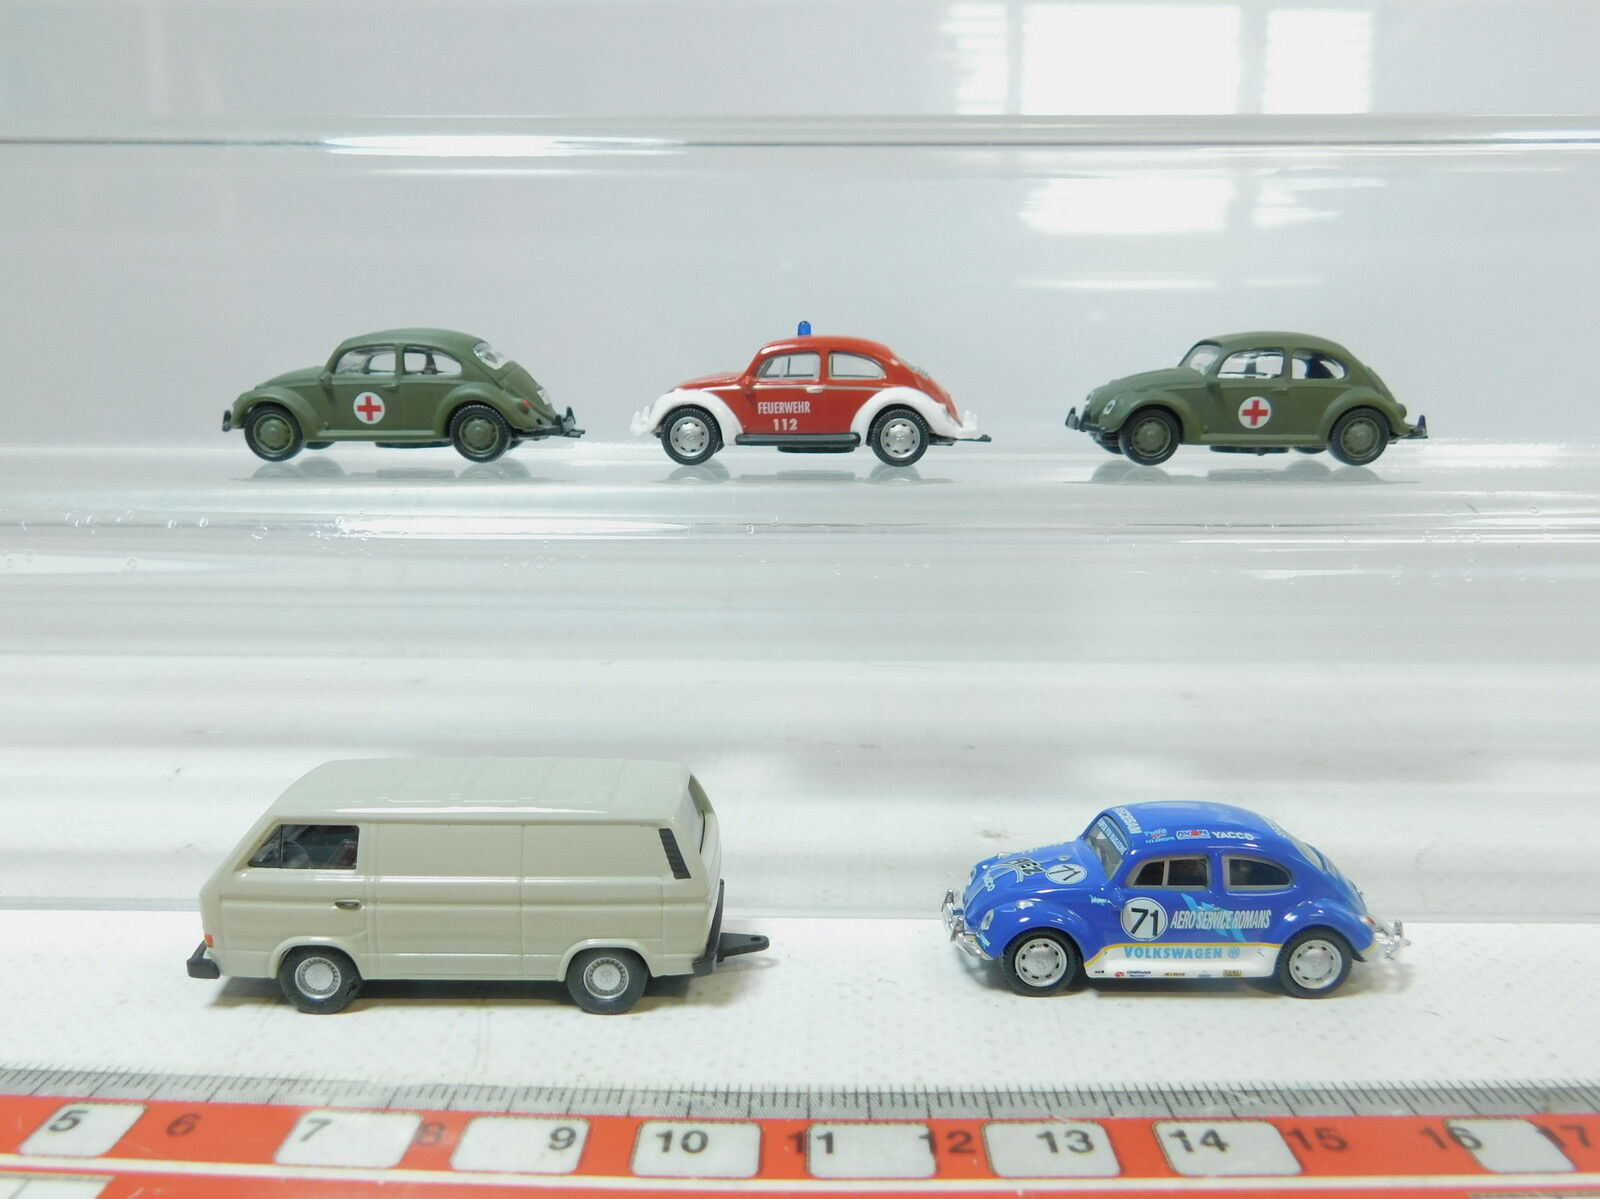 AZ433-0,5 AZ433-0,5 AZ433-0,5  5x Schuco H0 (1 87) VW  Feuerwehr FW+Aero Serviceromans+DRG, s.g.  | Outlet Online Store  28829d